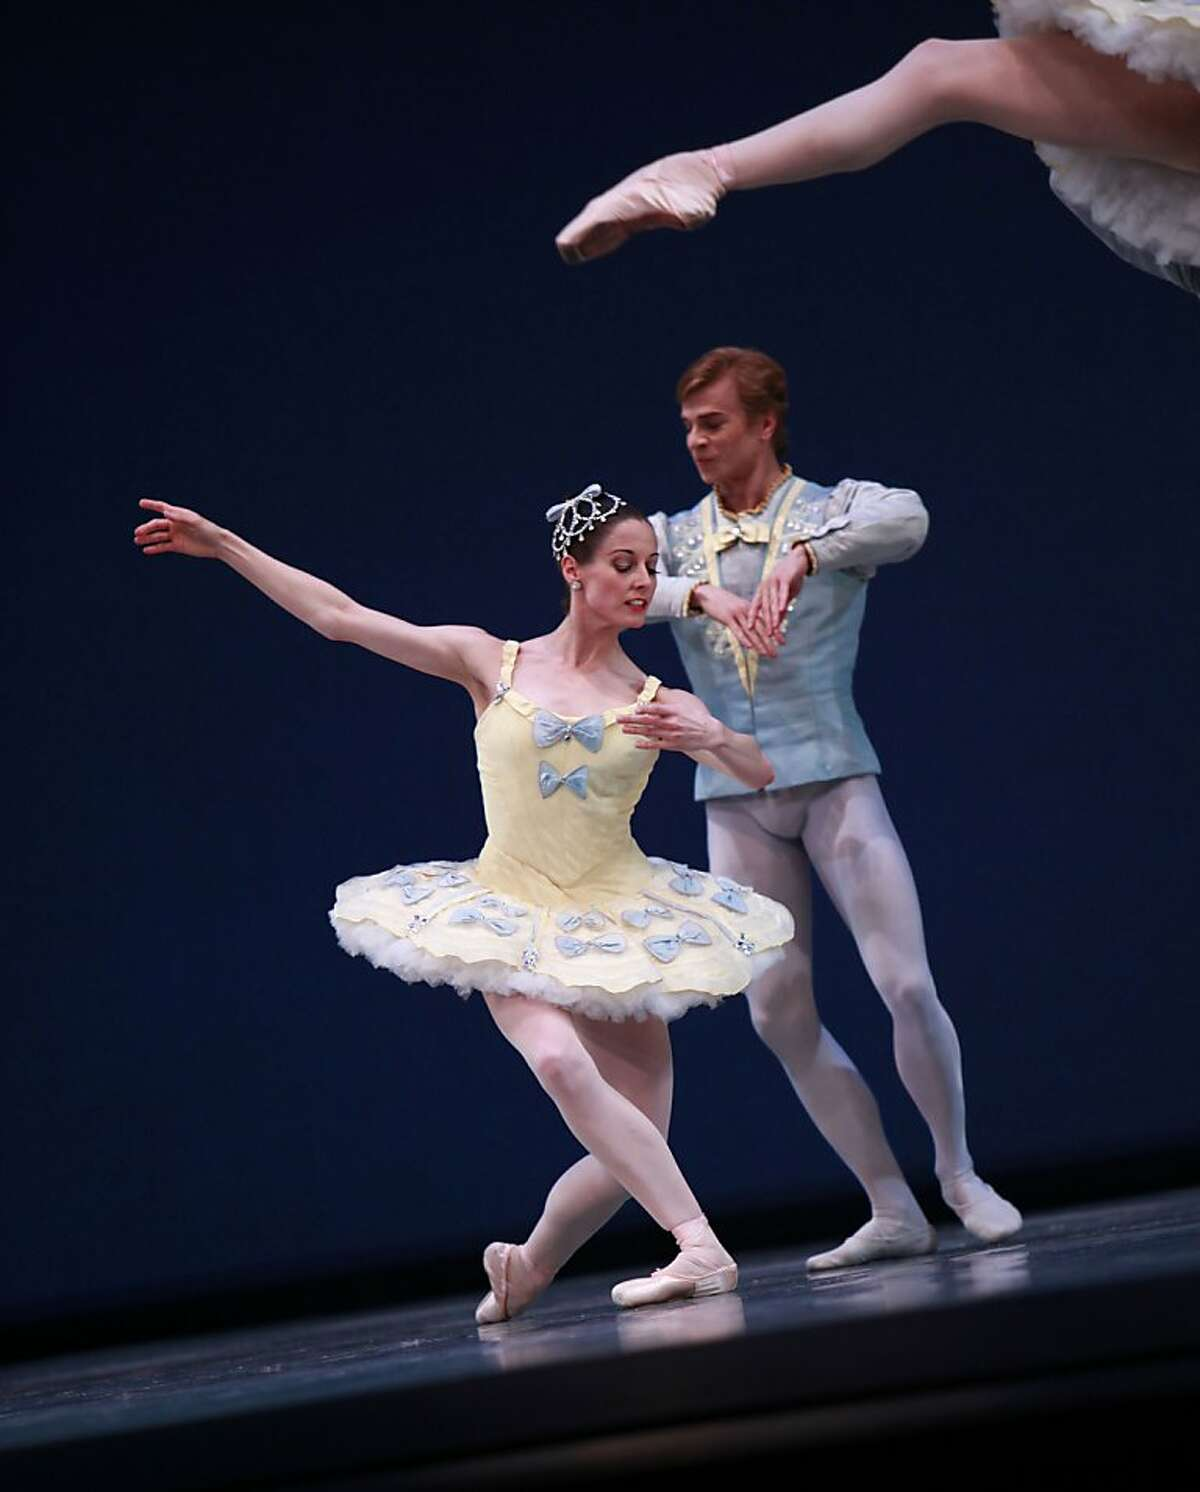 Gennadi Nedvigin and Dana Genshaft perform at the dress rehearsal of Program 7 for the San Francisco Ballet at the War Memorial Opera House in San Francisco, California on Thursday, April 12, 2012.